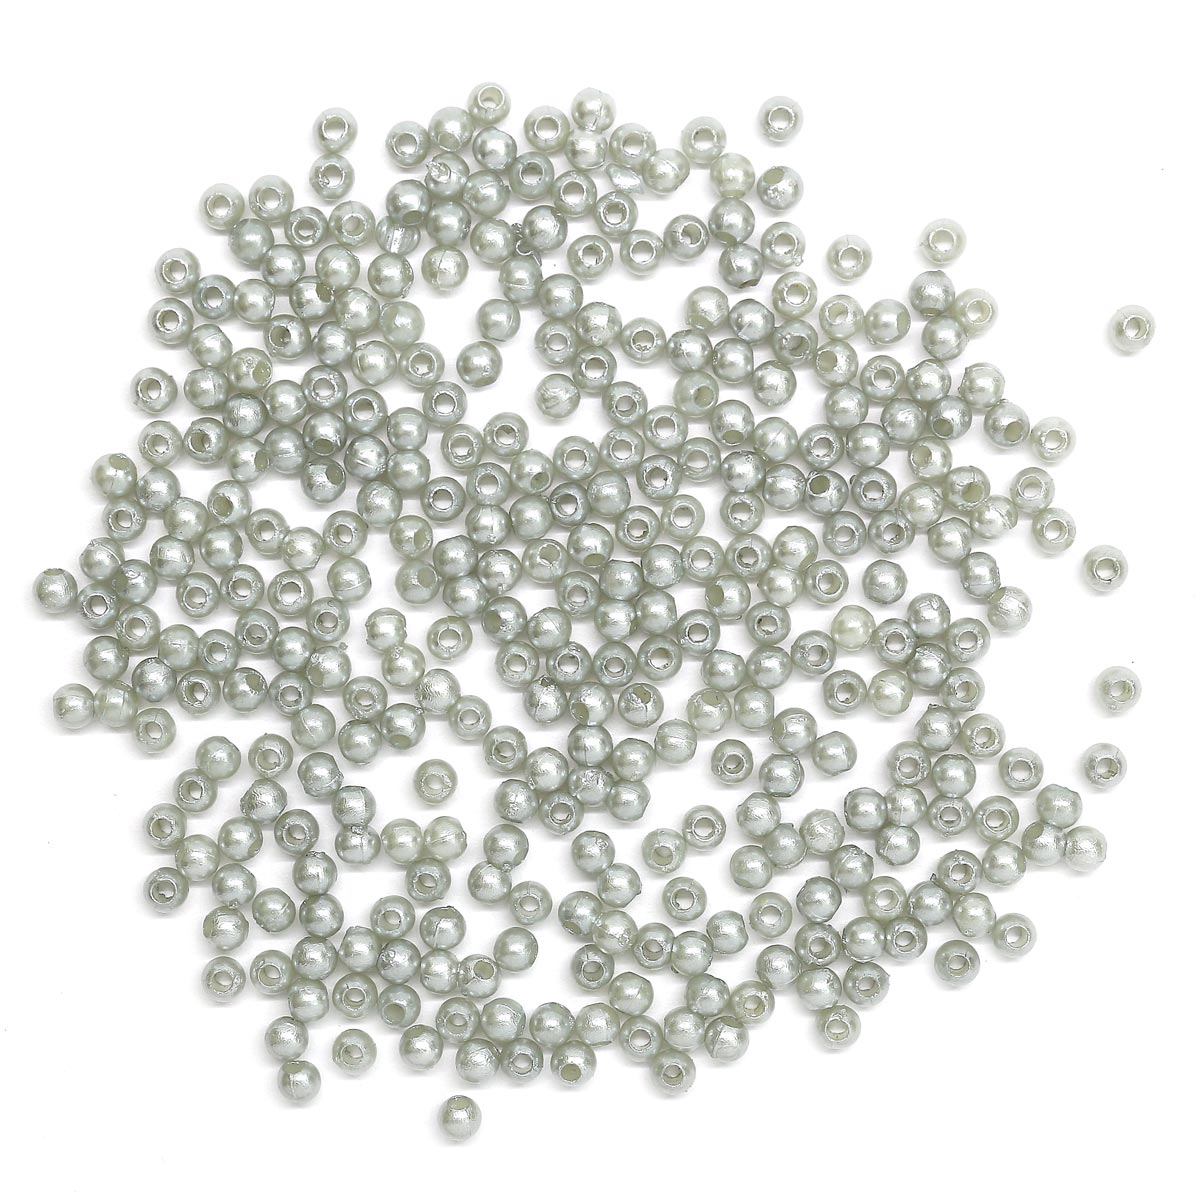 Бусины круглые, пластик, 3 мм, упак./20 гр., 'Астра'